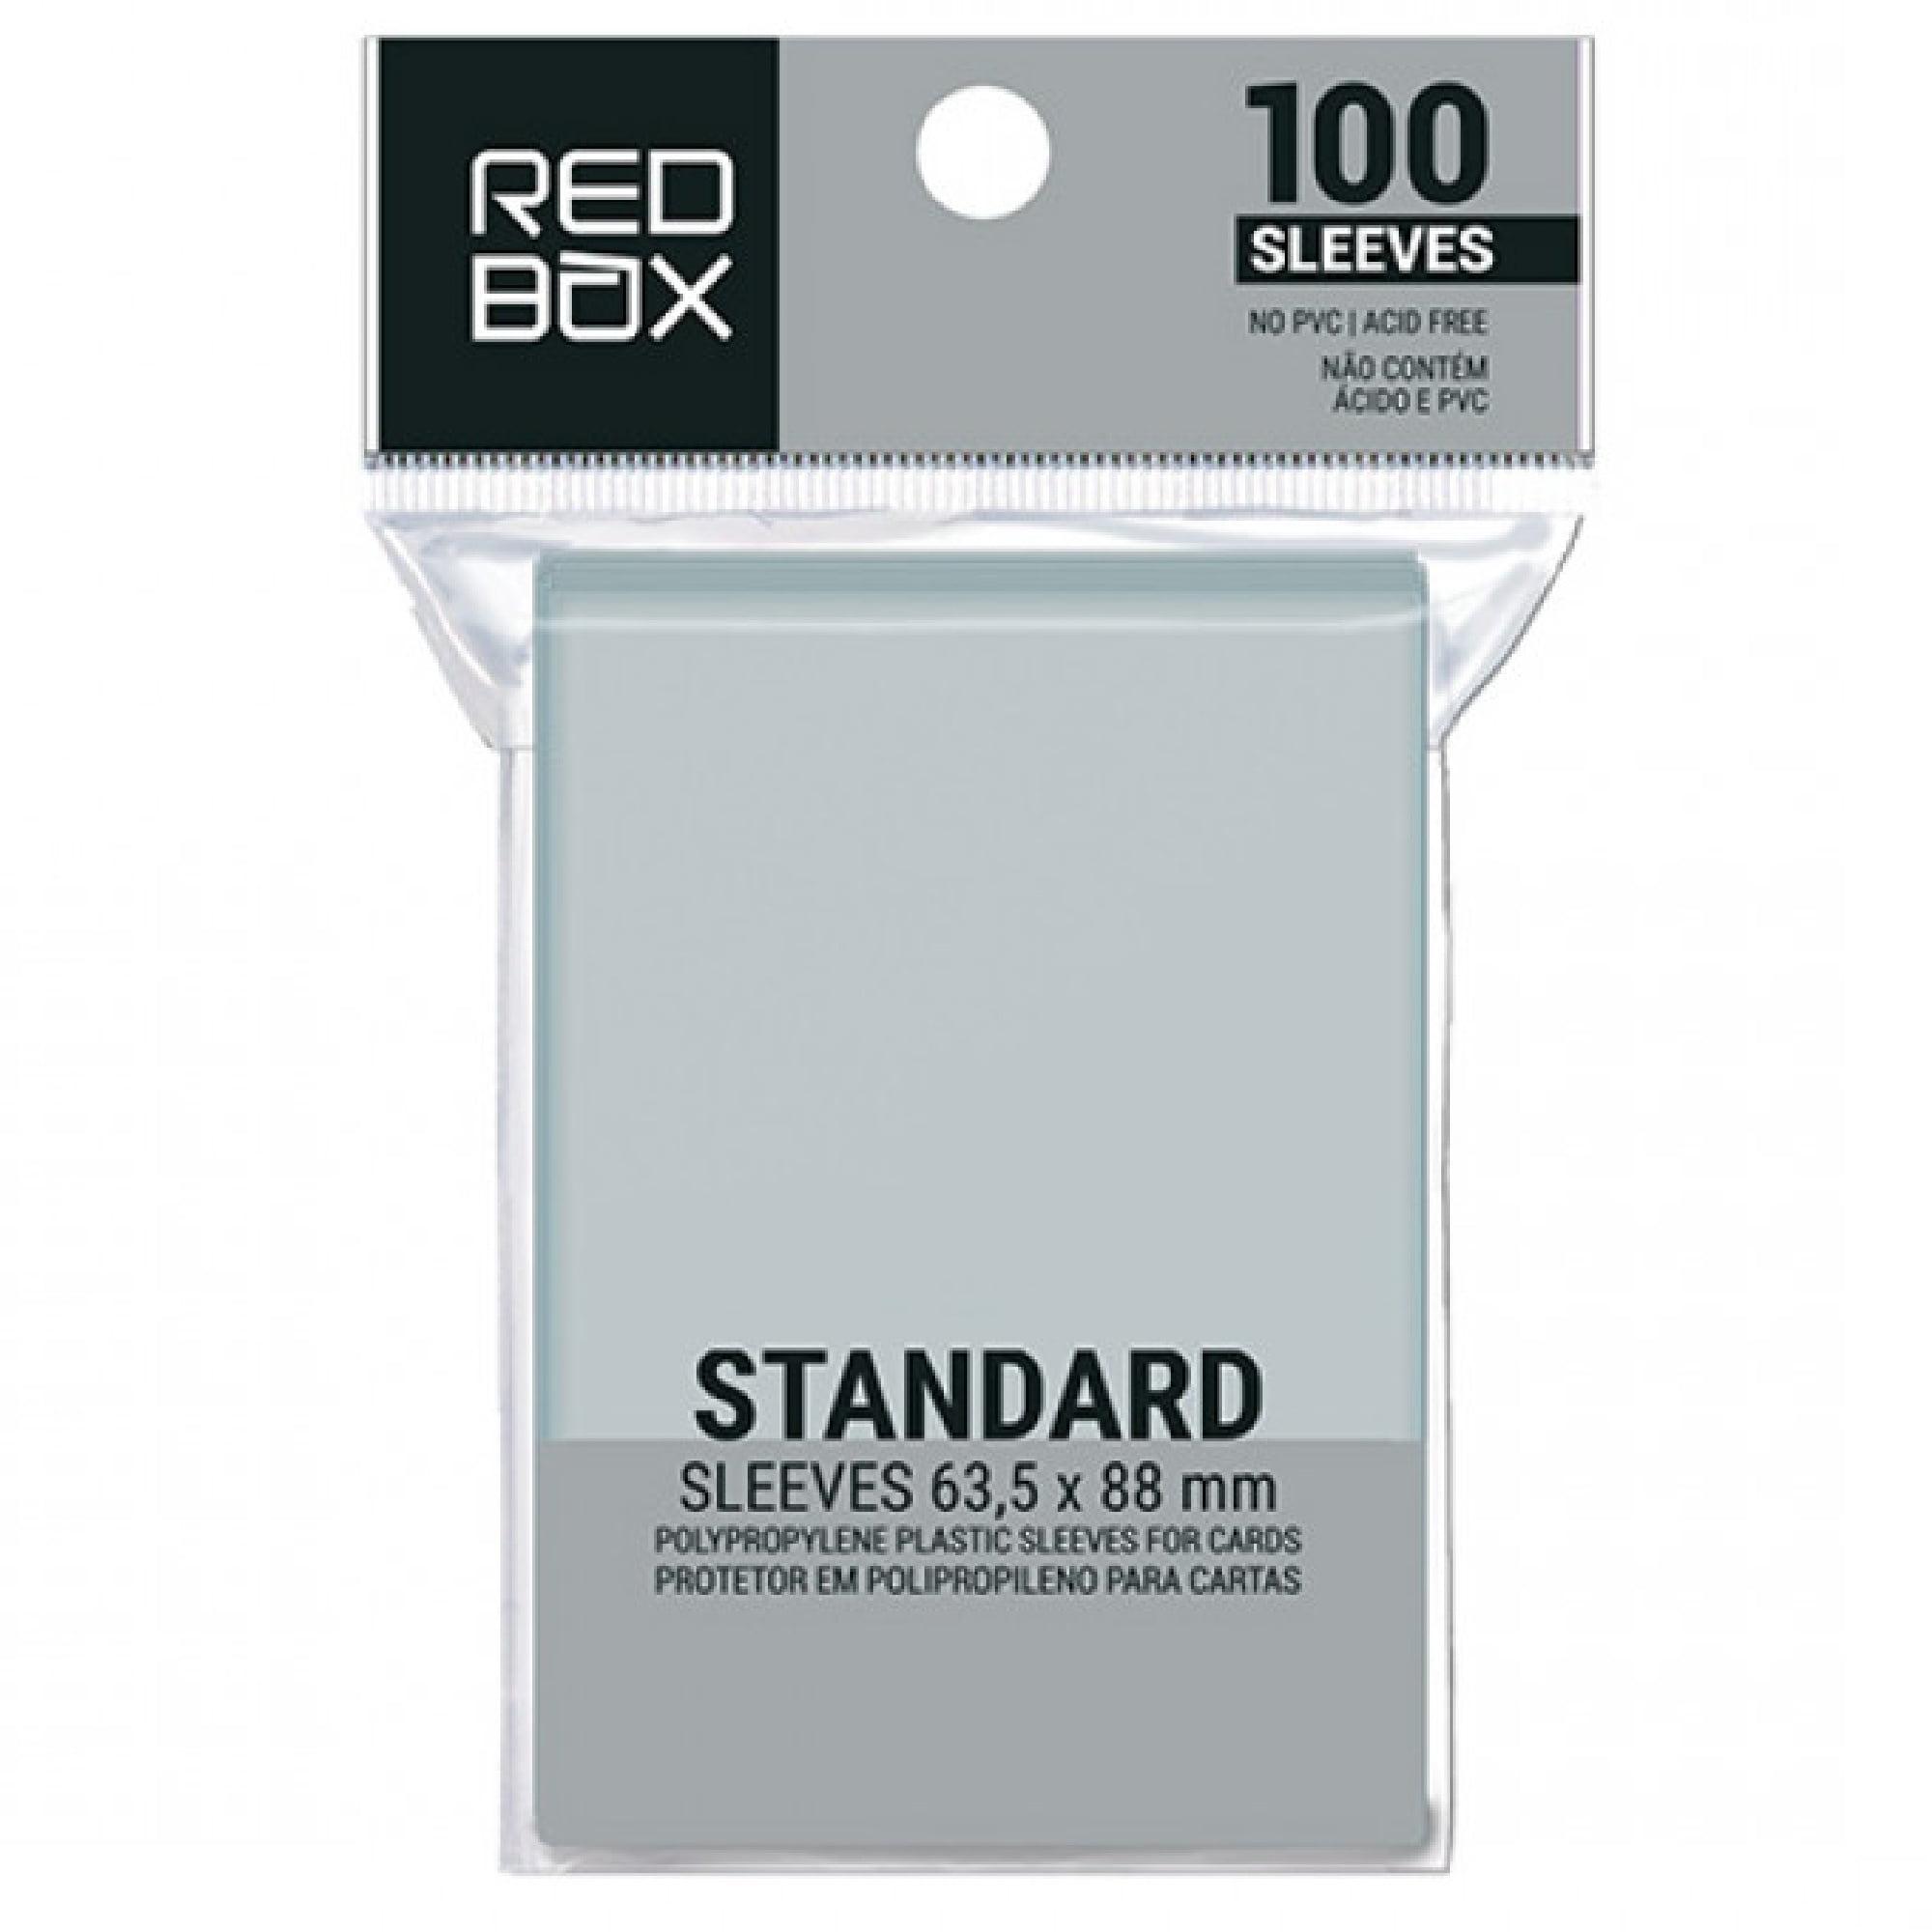 Sleeves Standard (63,5 x 88mm) Redbox